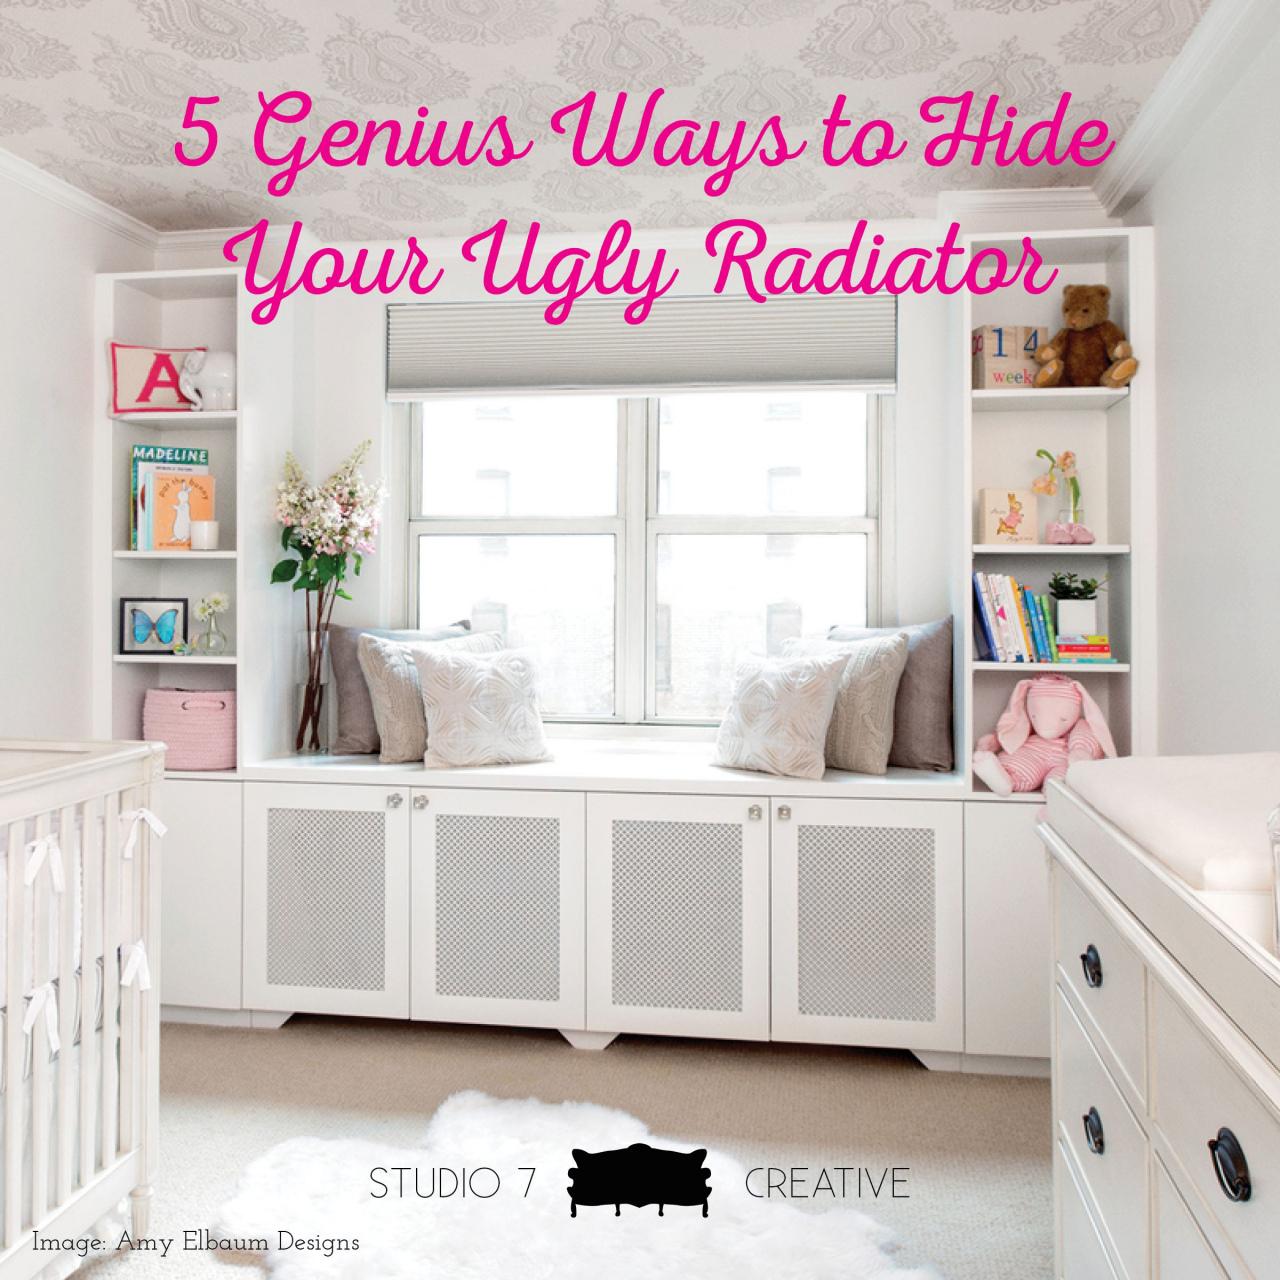 my baby babyzimmer 5 genius ways to hide your ugly radiator wohnzimmer durch my baby babyzimmer